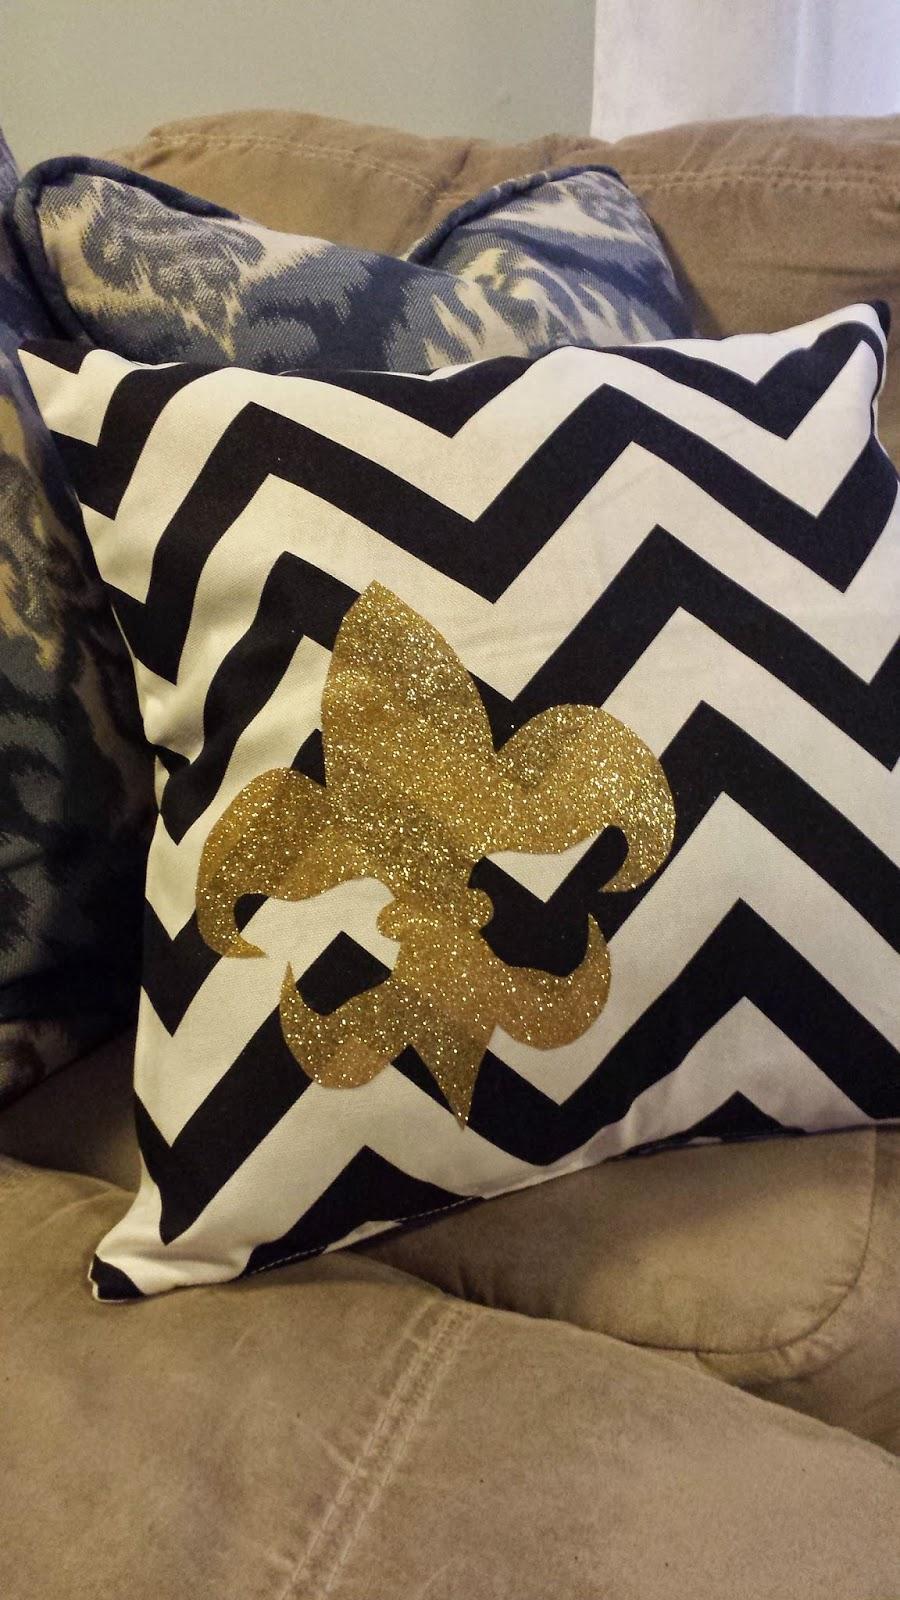 Diy Giant Chevron Floor Pillows : Nadia s DIY Projects: DIY Fleur De Lis Chevron Pillow